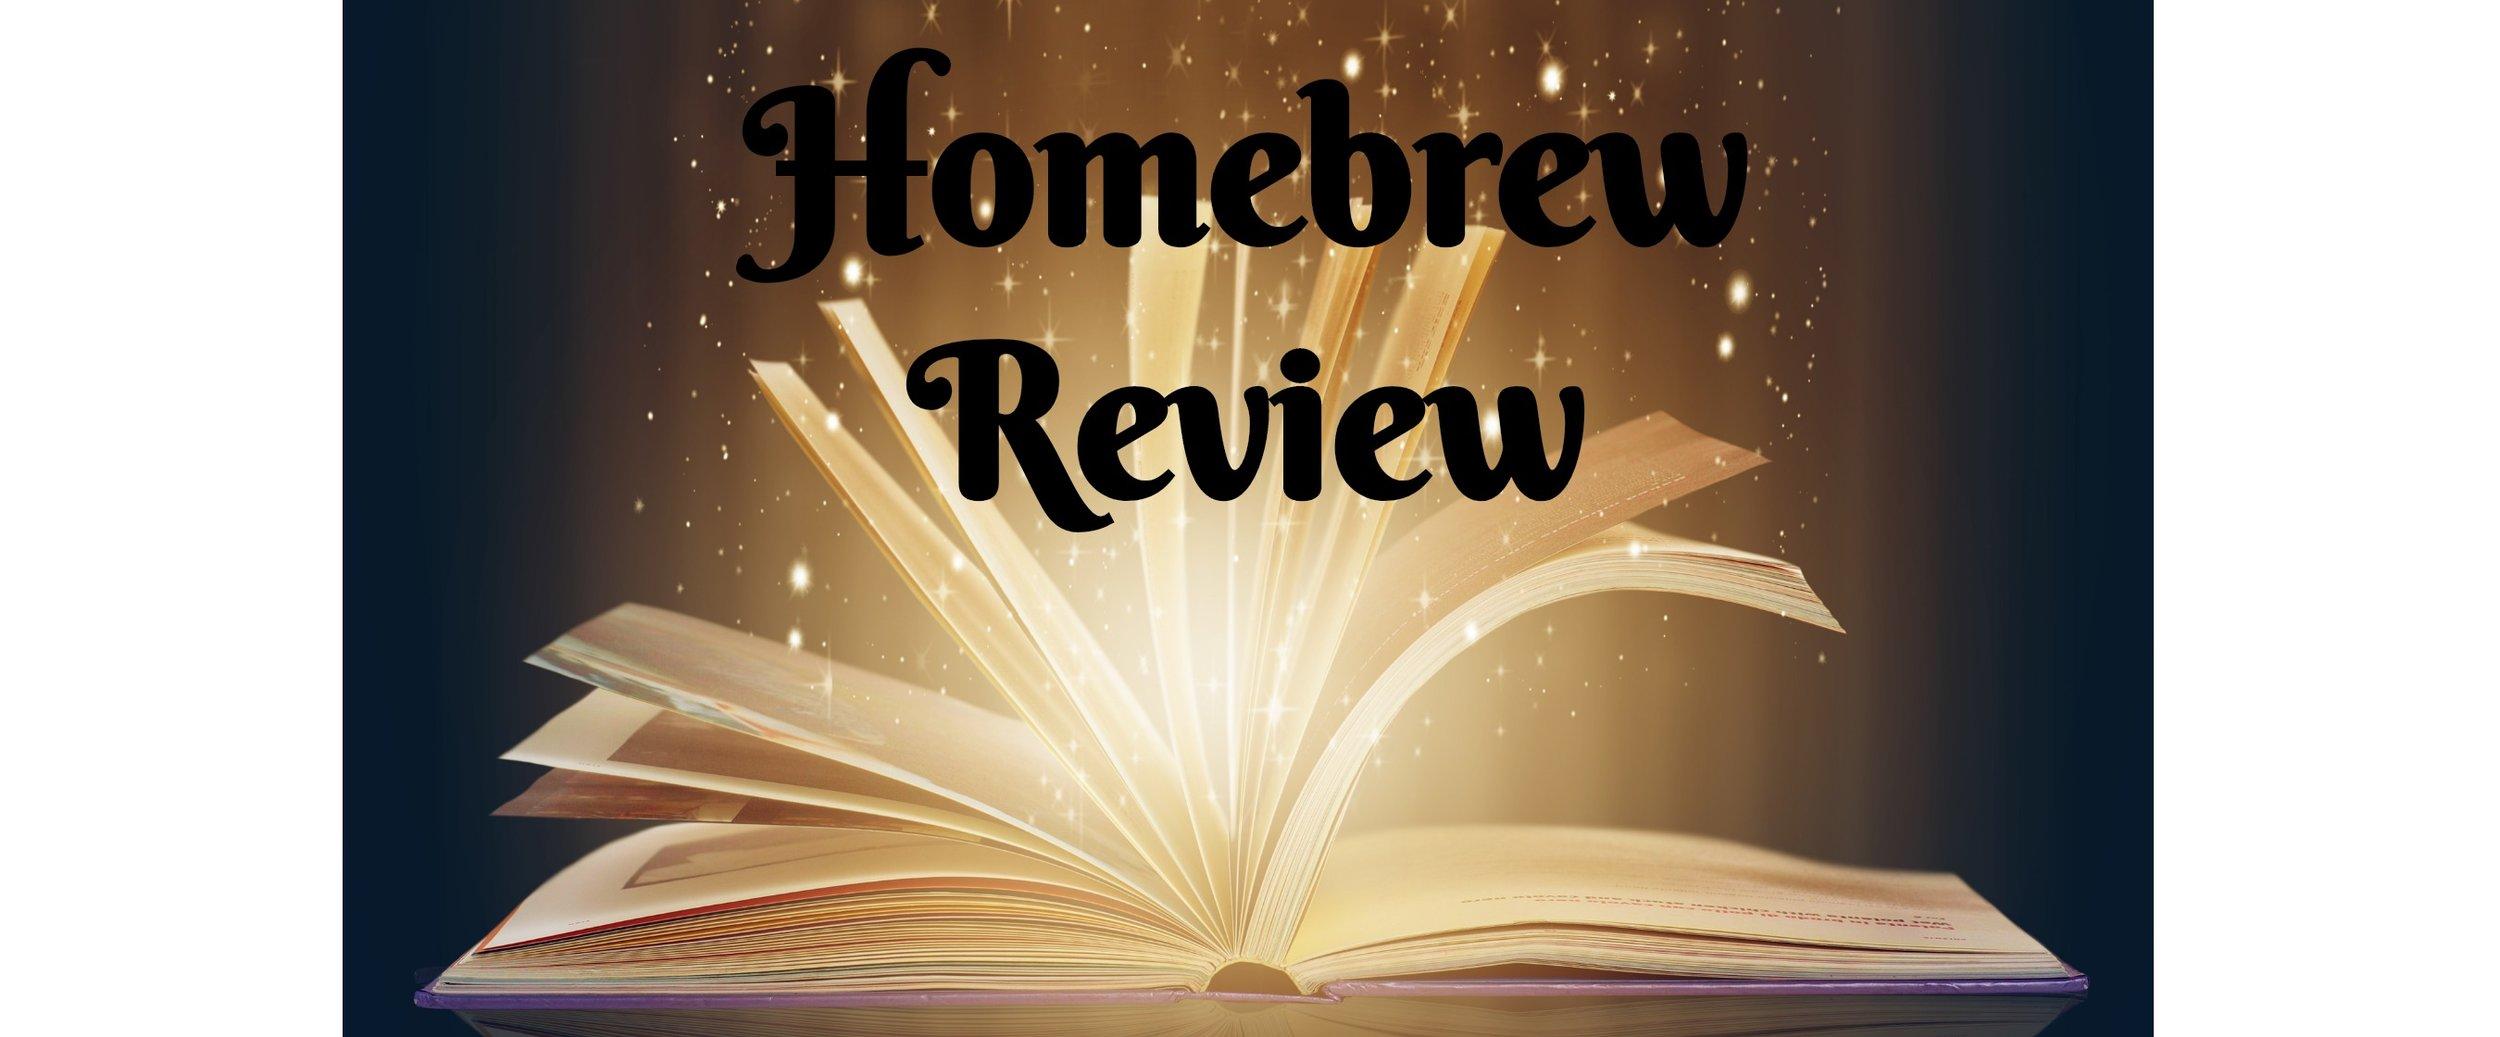 Homebrew Review 2700x1120.jpg